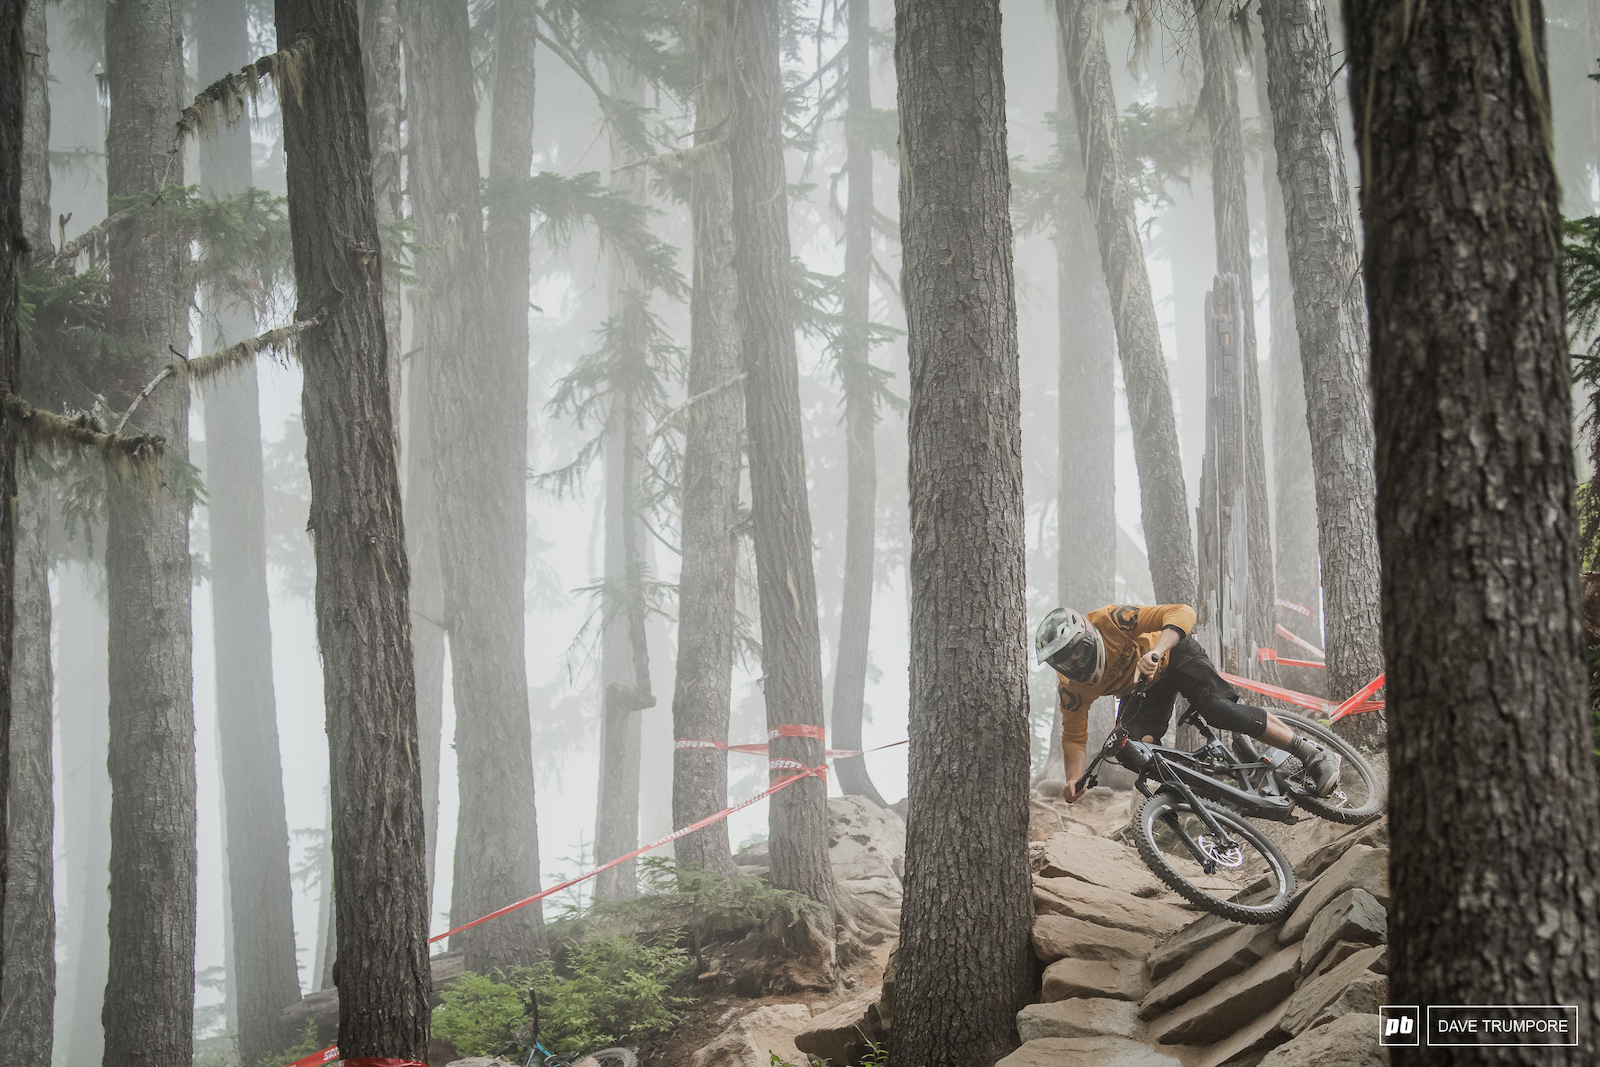 Dan Wolfe drops in through the fog in between his live Pinkbike social media updates